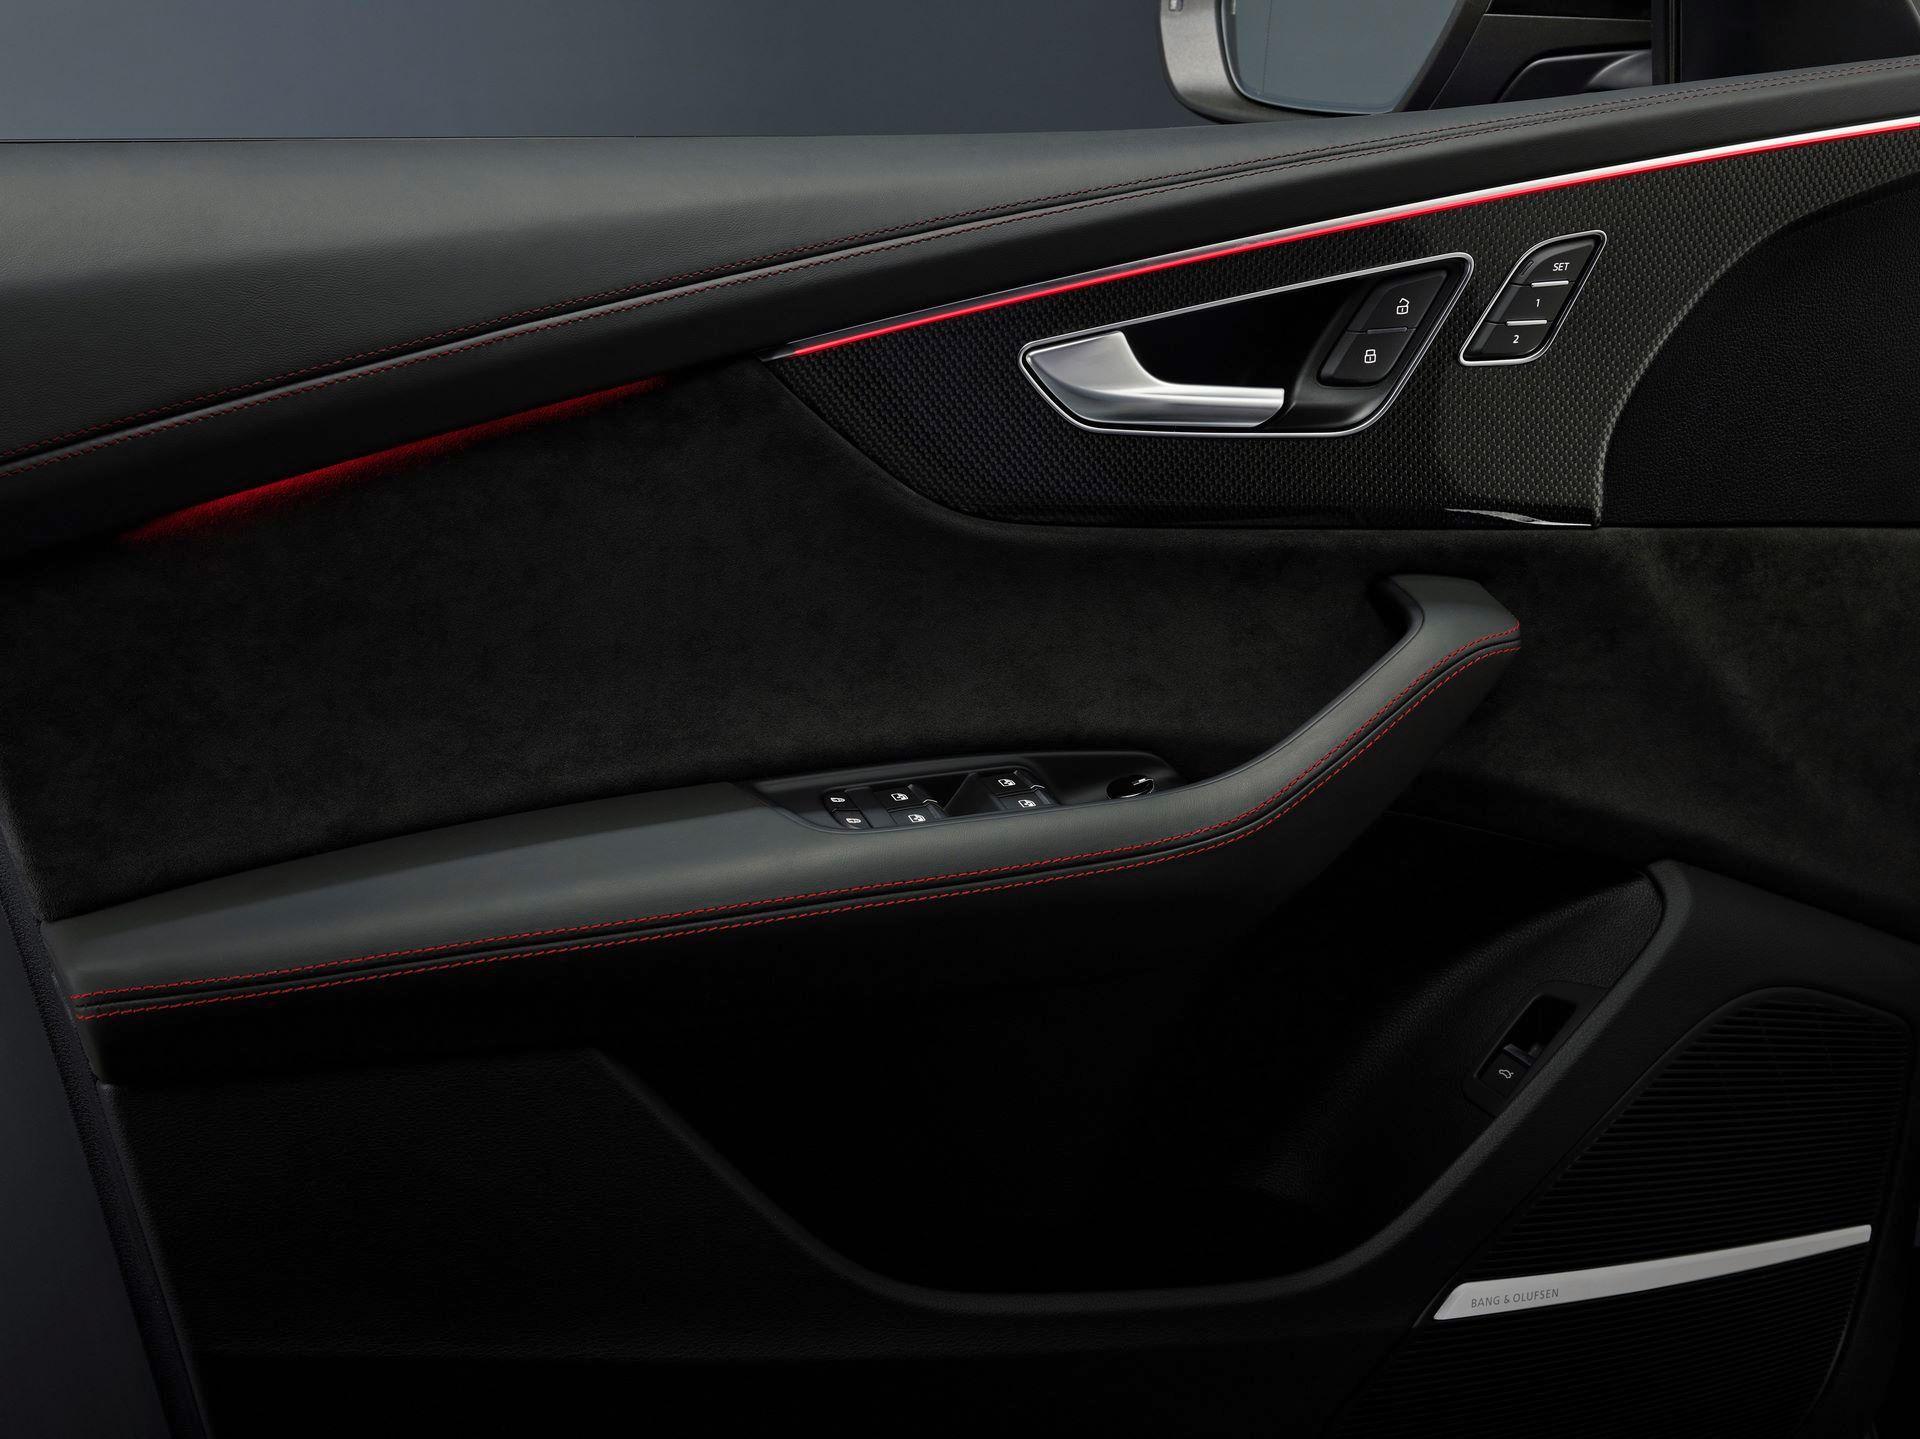 Audi-A4-A5-Q7-Q8-Competition-And-Competition-Plus-Trims-35